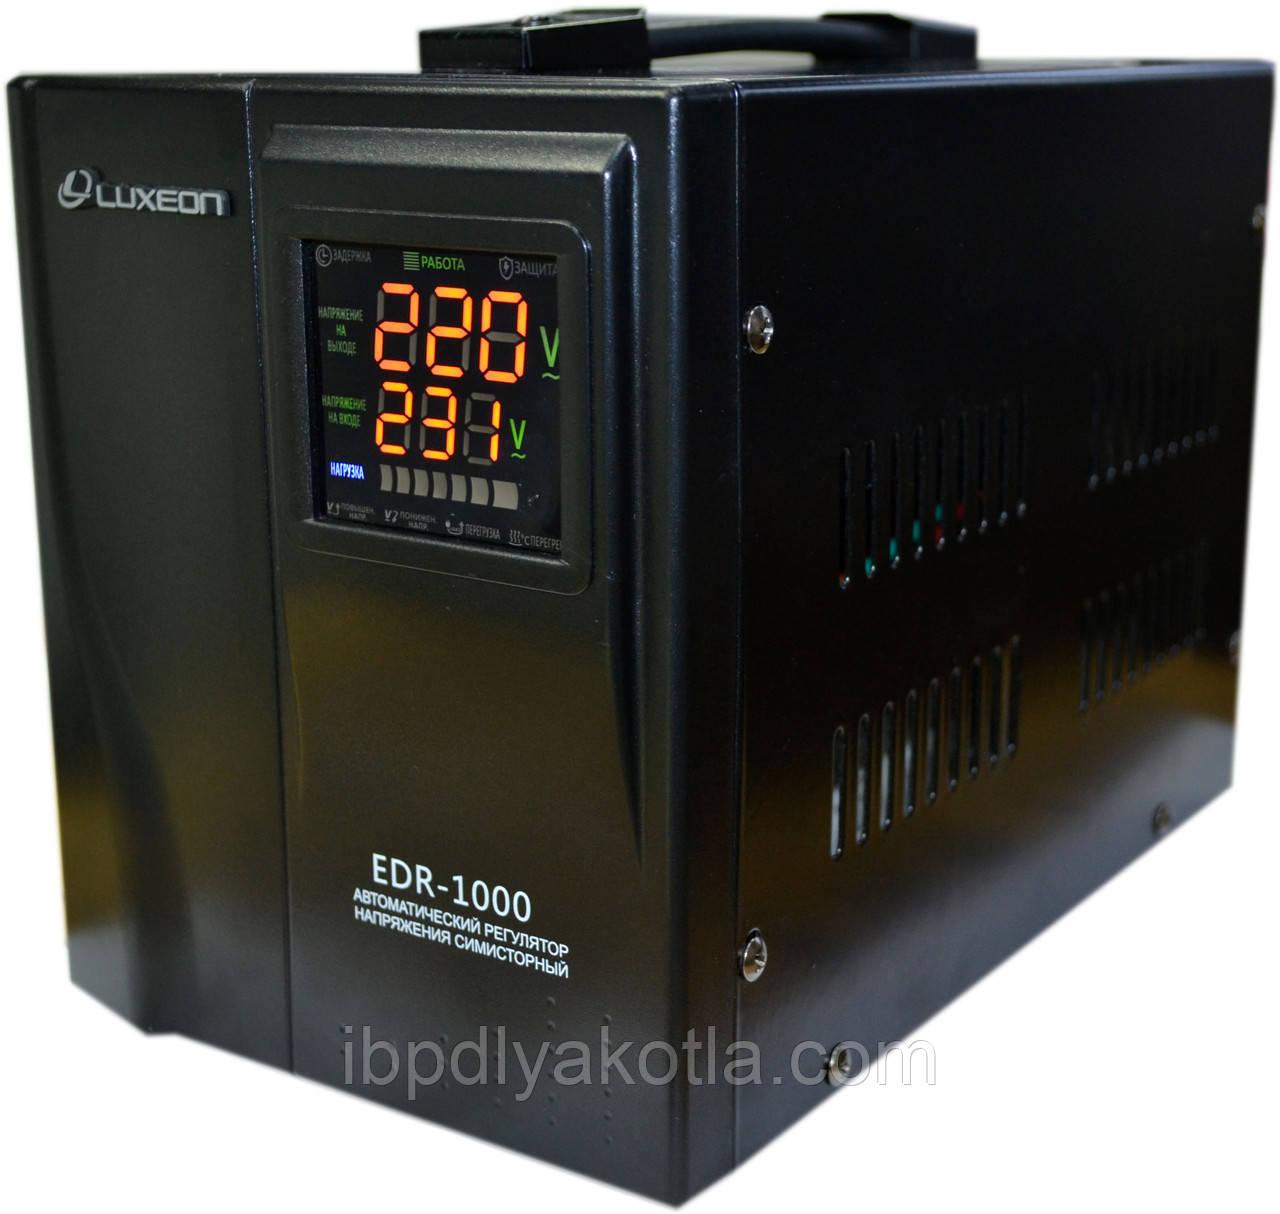 Luxeon EDR-1000VA (700Вт)